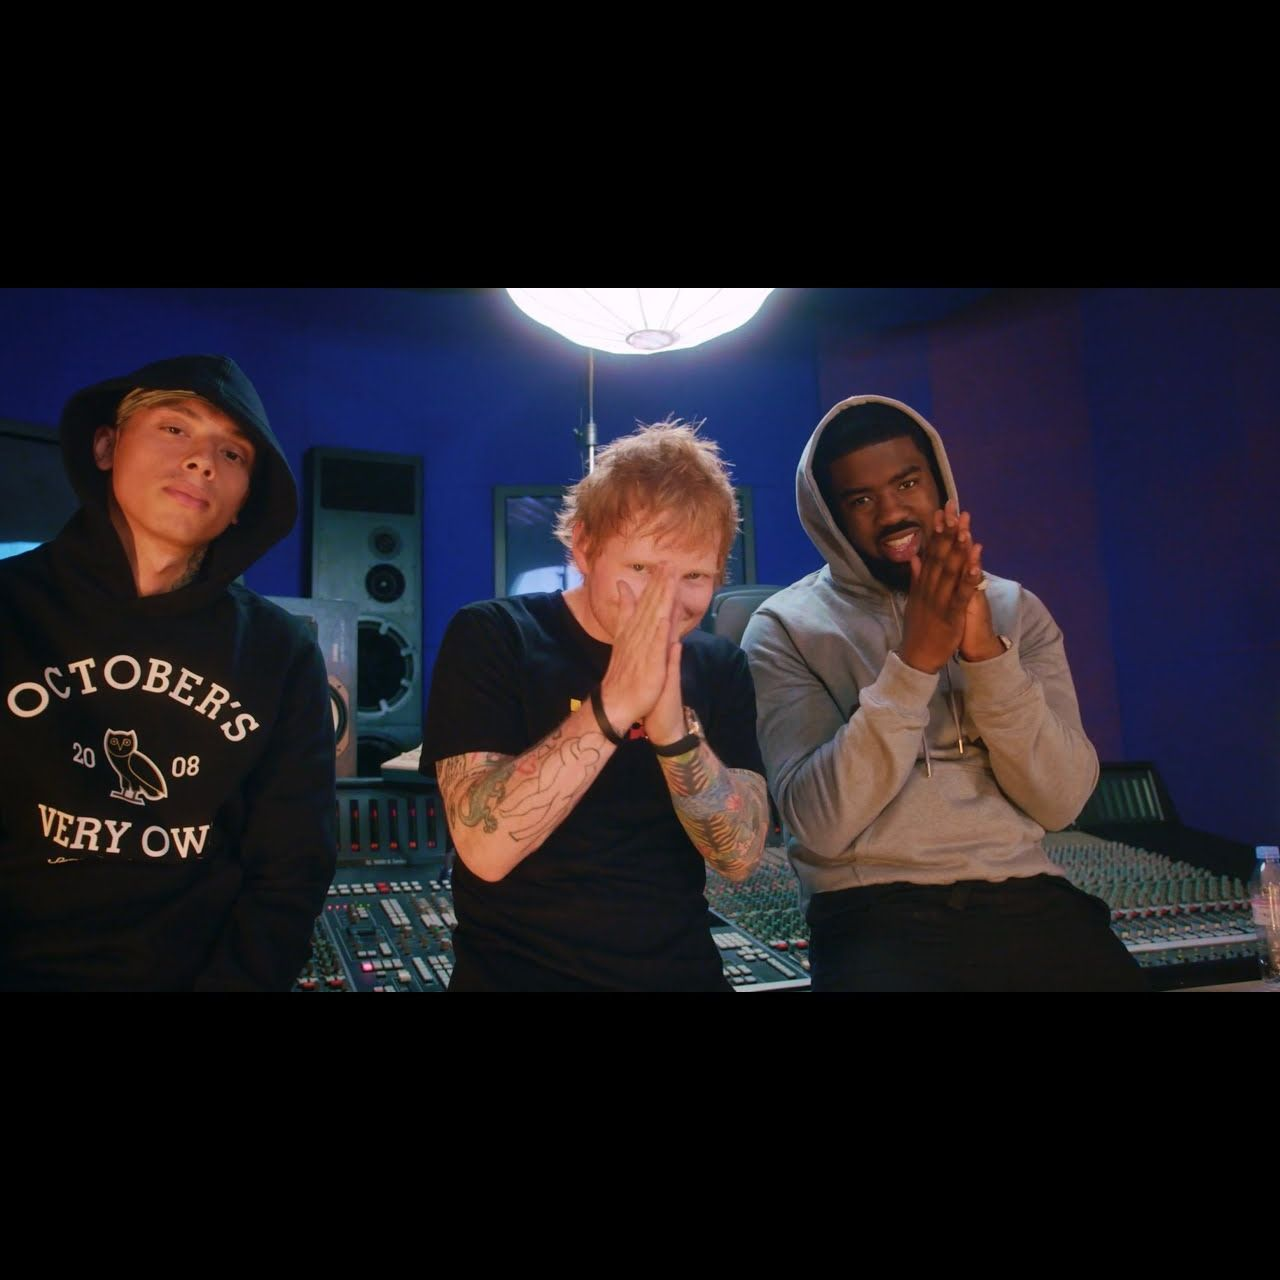 Ed Sheeran - Bad Habits (Fumez The Engineer Remix) (ft. Tion Wayne and Central Cee) (Thumbnail)